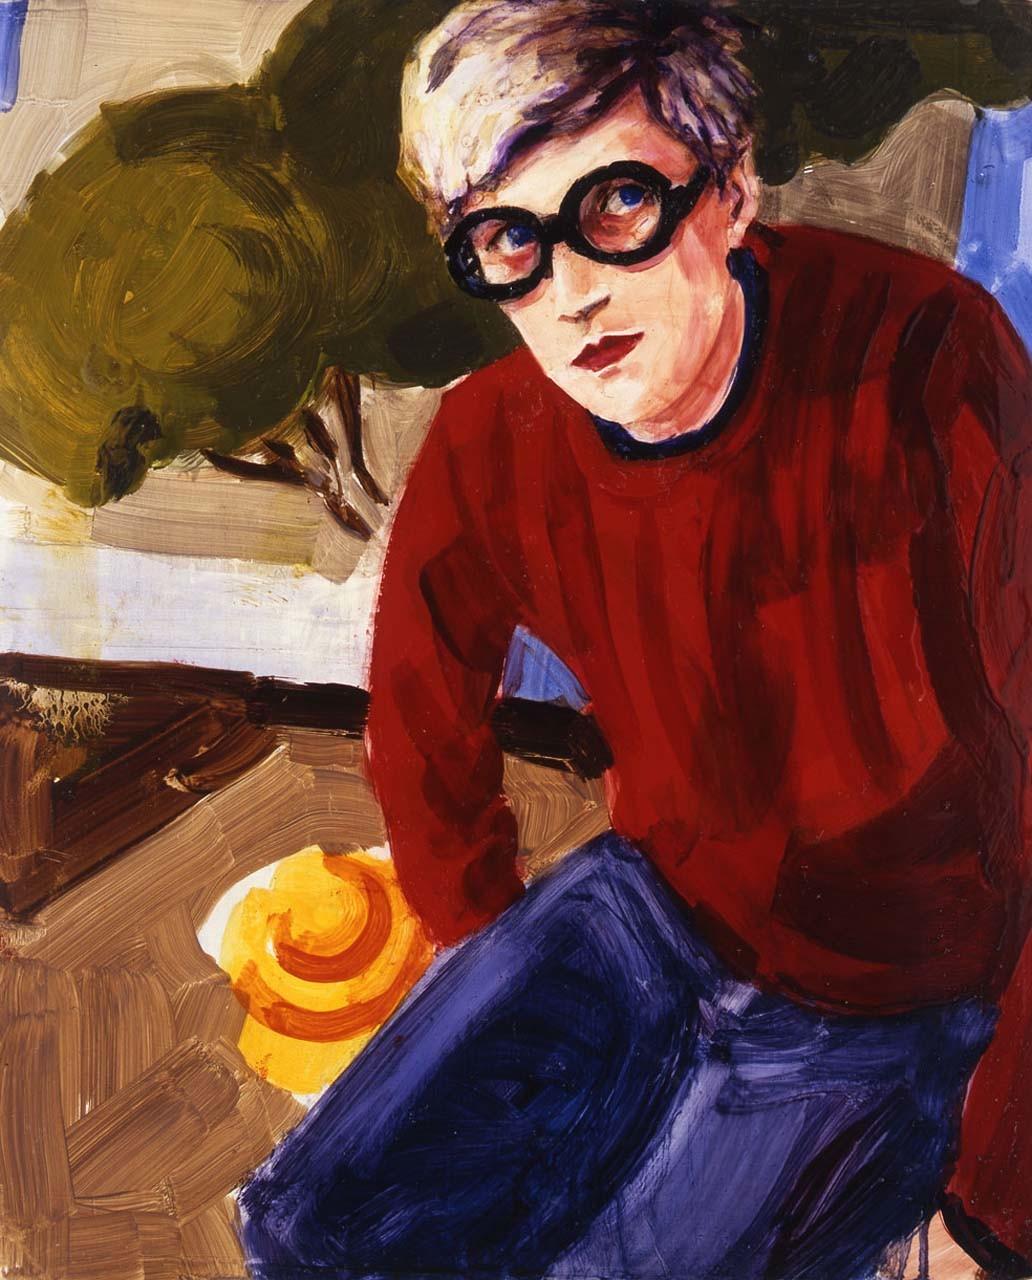 "<div class=""artwork_caption""><p>David Hockney Aged 32, 1997</p></div>"